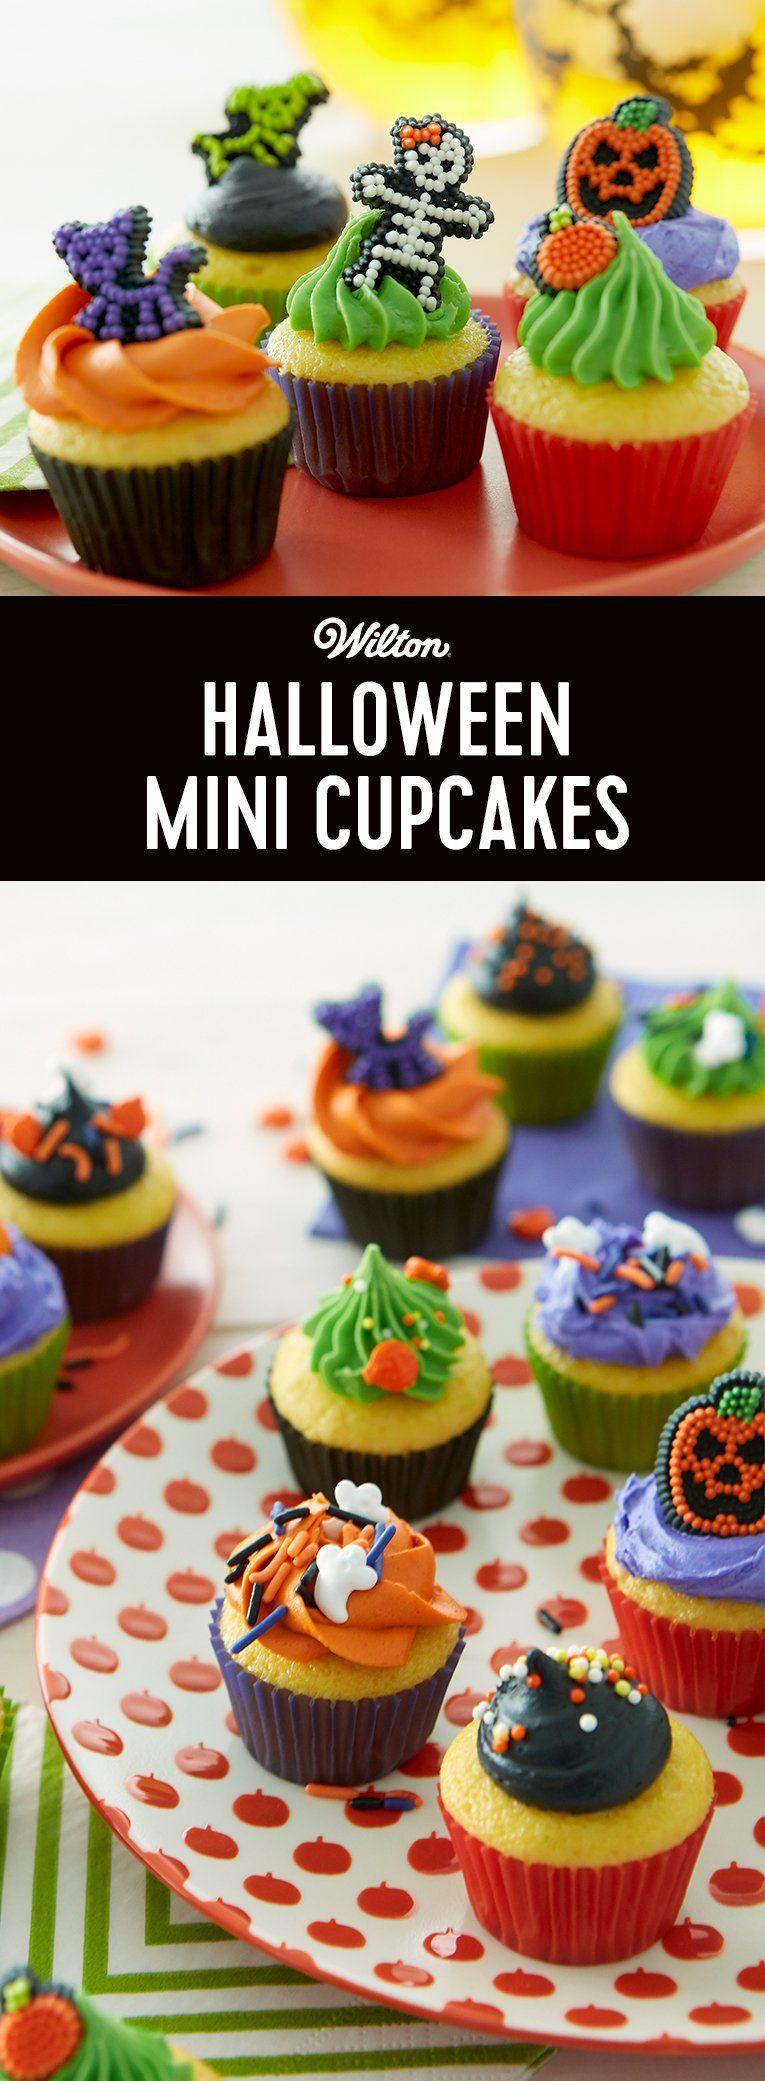 Halloween mini cupcakes halloween cupcakes halloween - Halloween decorations for cupcakes ...